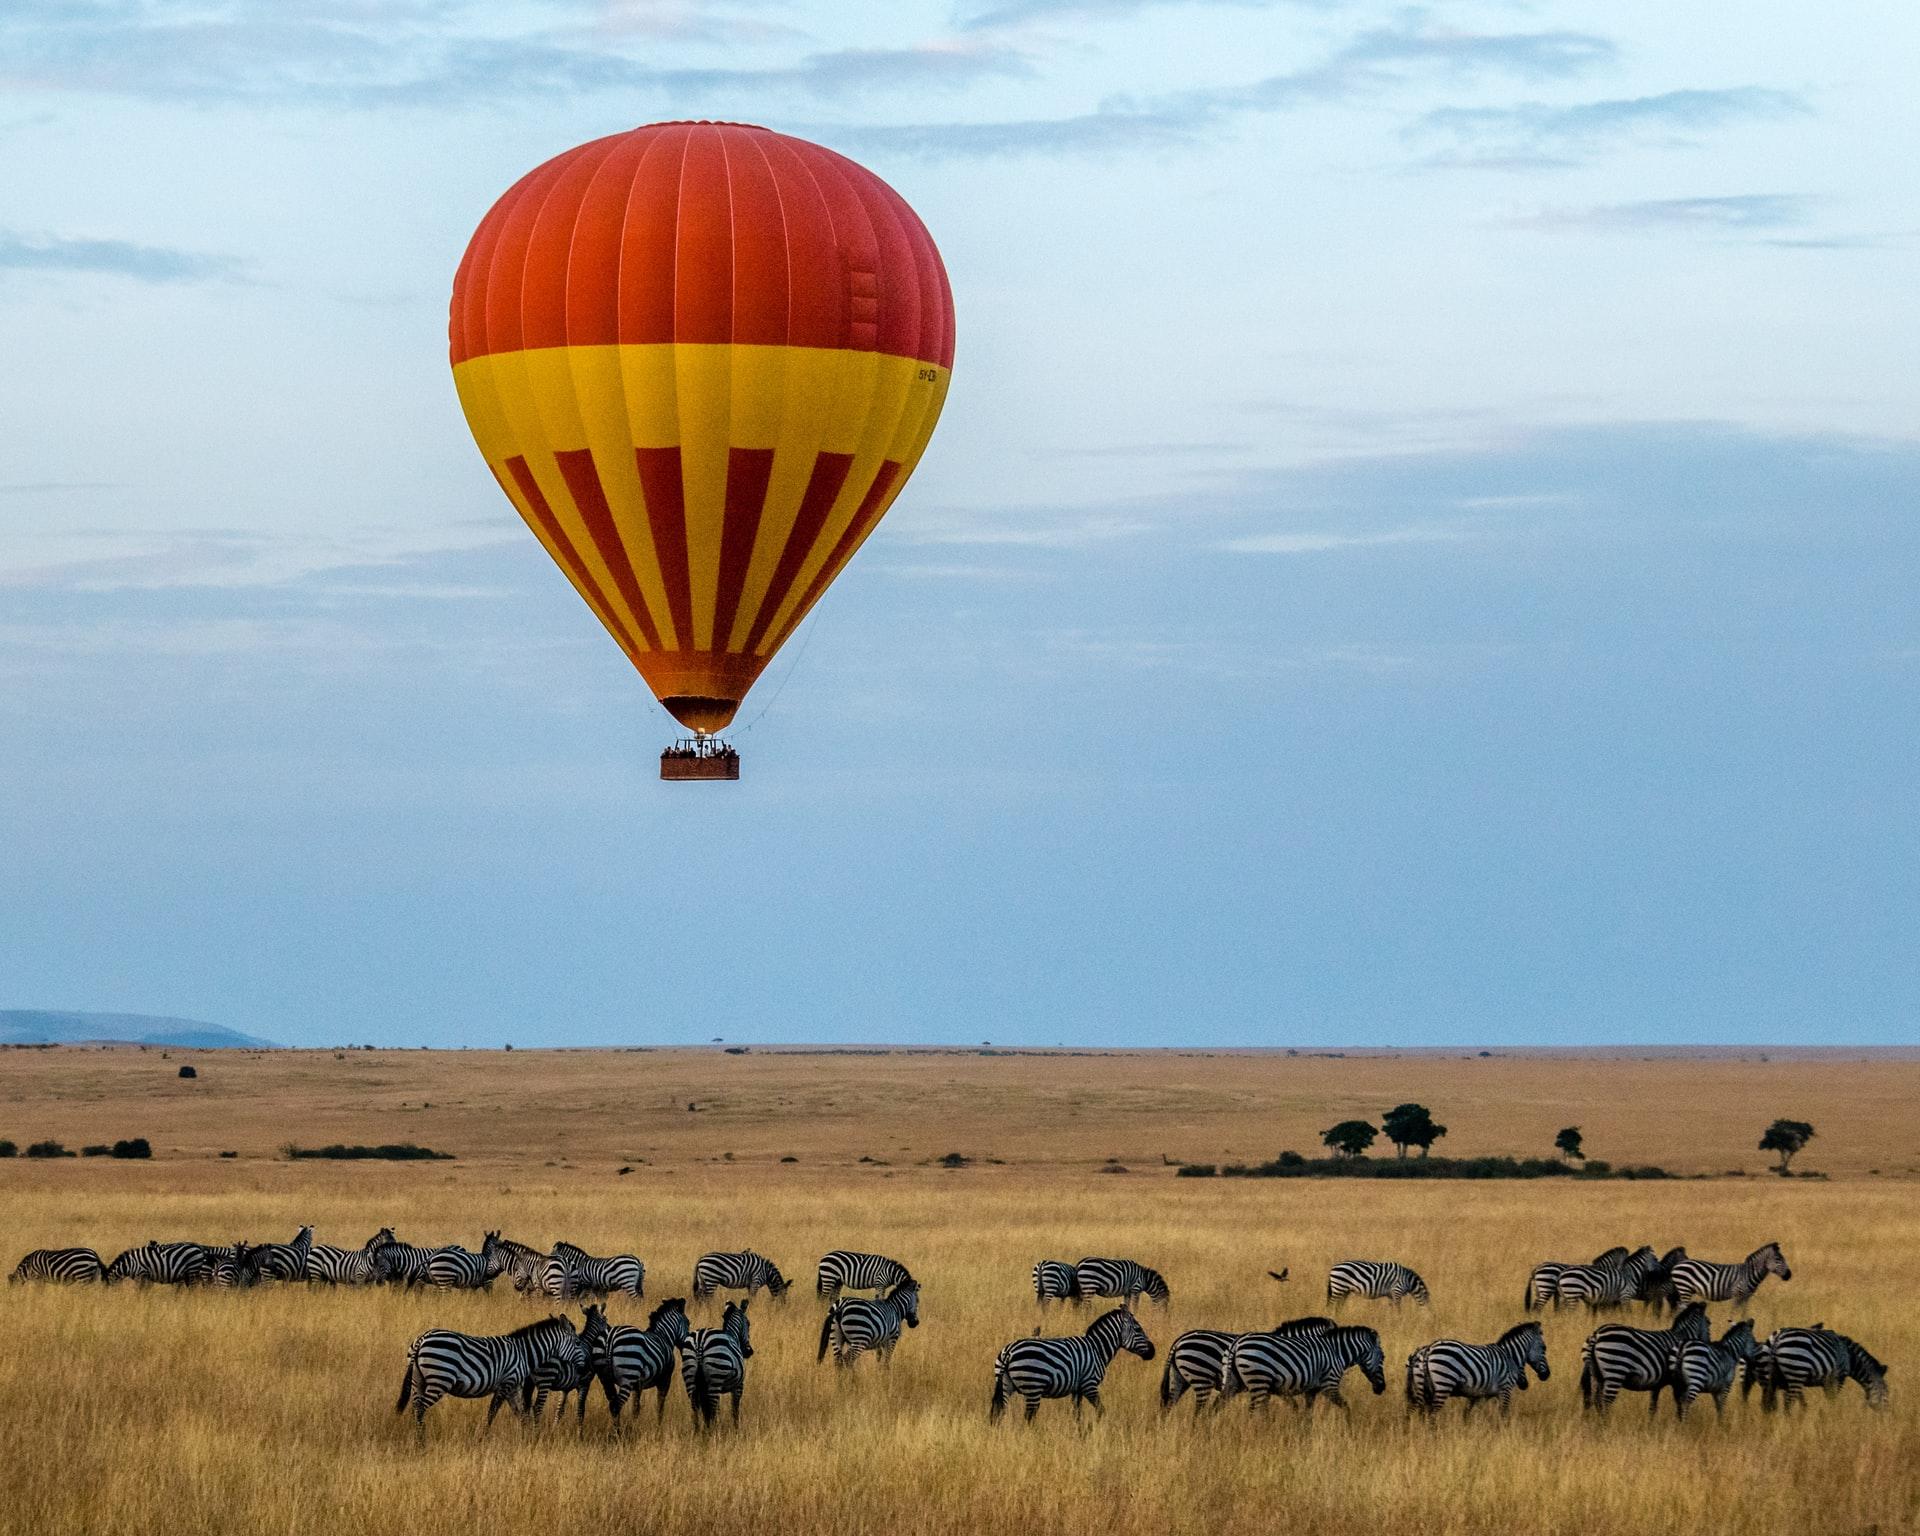 Maasai Mara National Reserve, Narok County, Kenya tours with Trafalgar